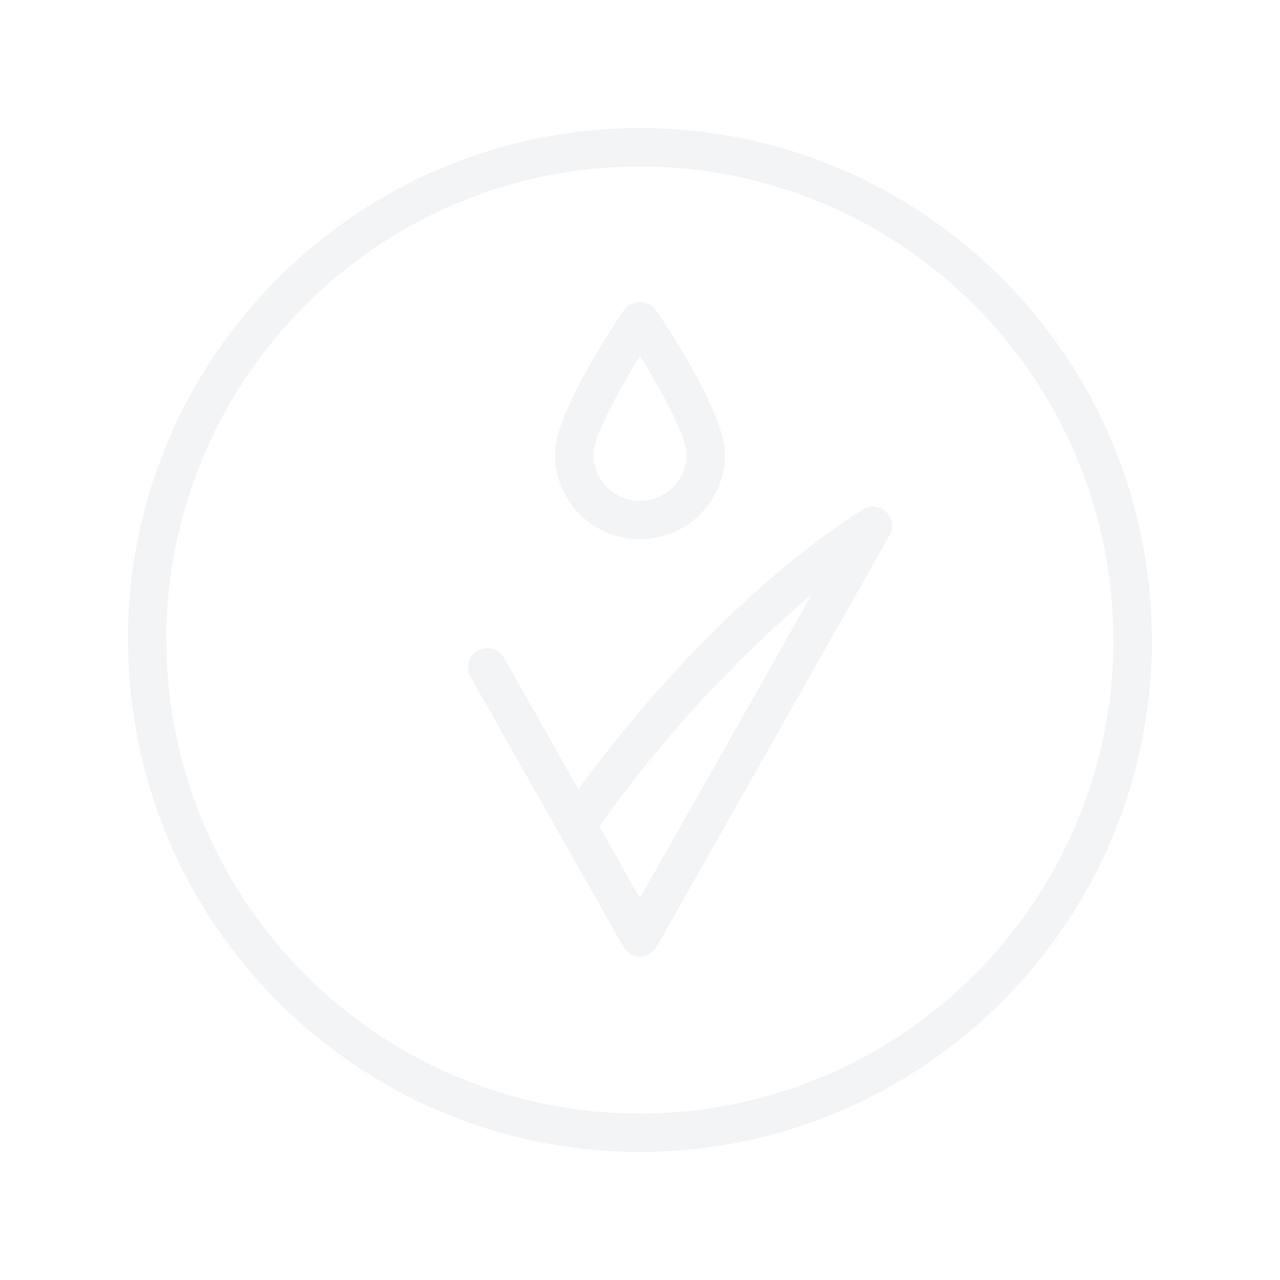 MISSHA All Around Safe Block Essence Sun Milk SPF50 70ml